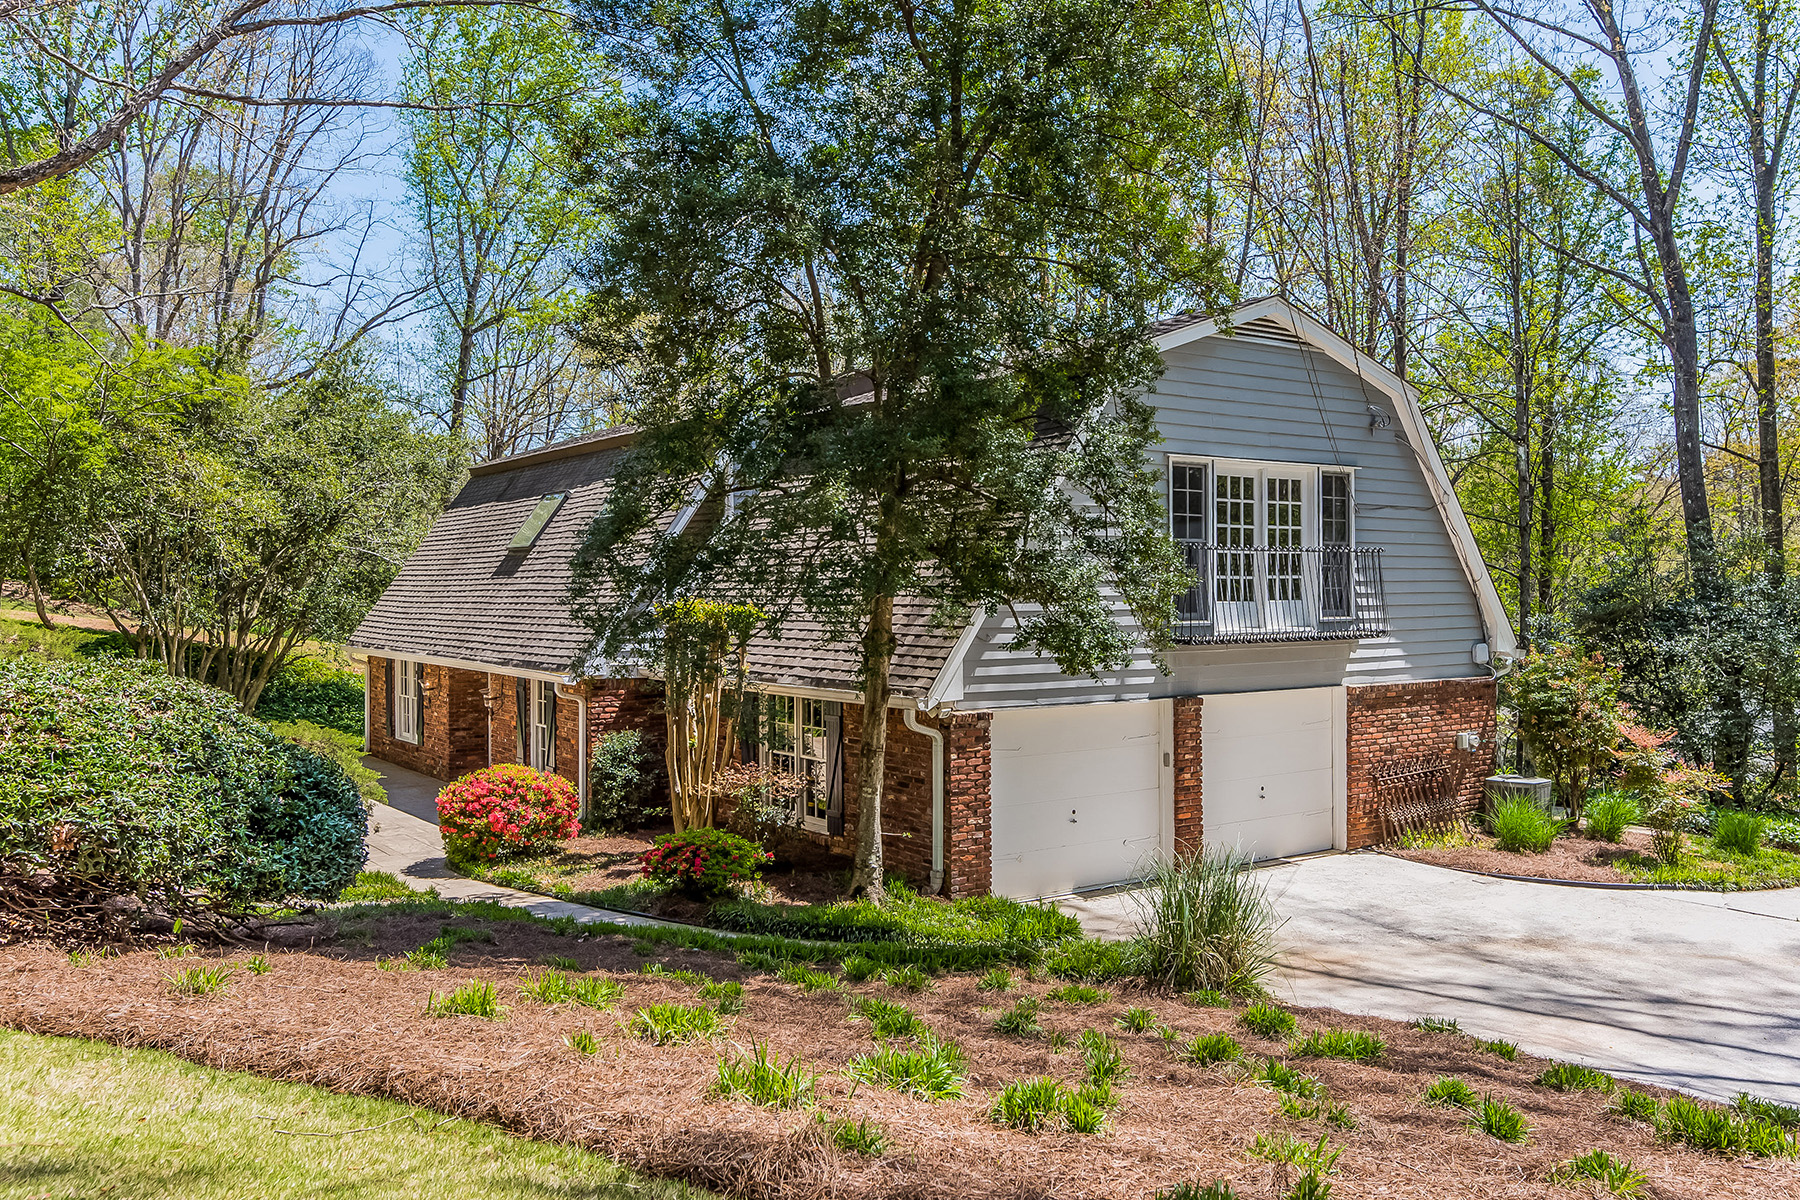 Single Family Home for Sale at Captivating Sandy Springs Cul-de-sac Beauty 355 Westerhall Ct Atlanta, Georgia 30328 United States